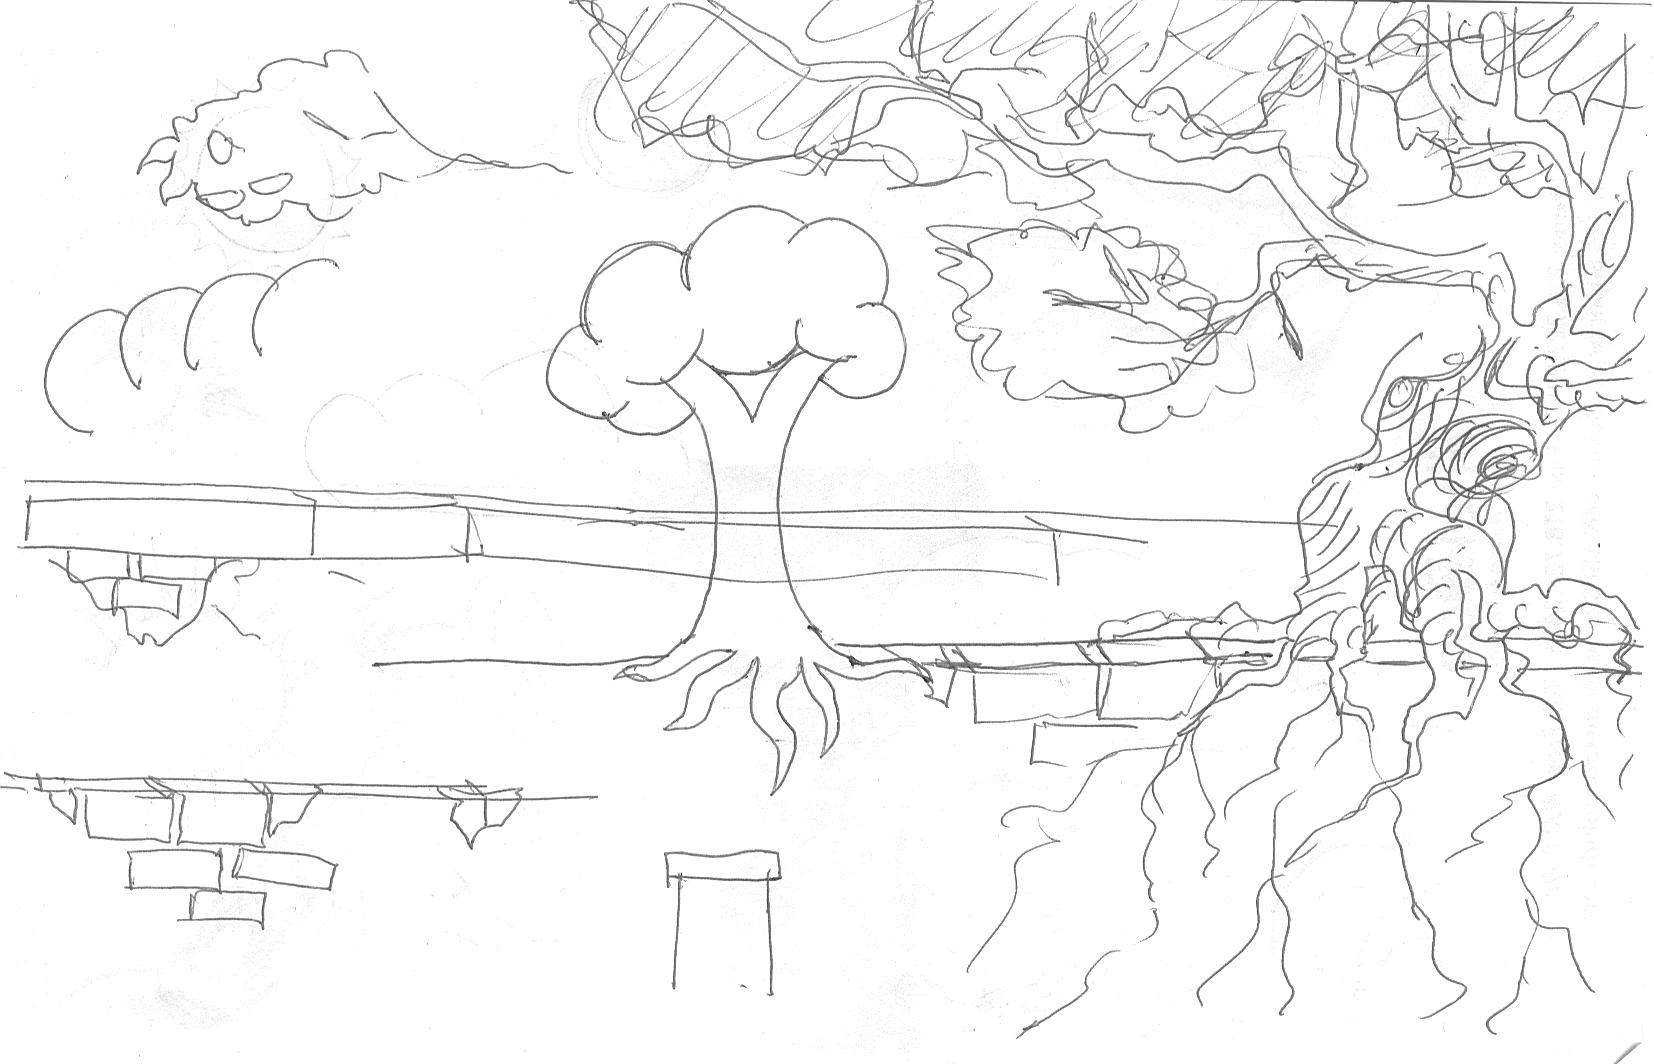 sketch20.png